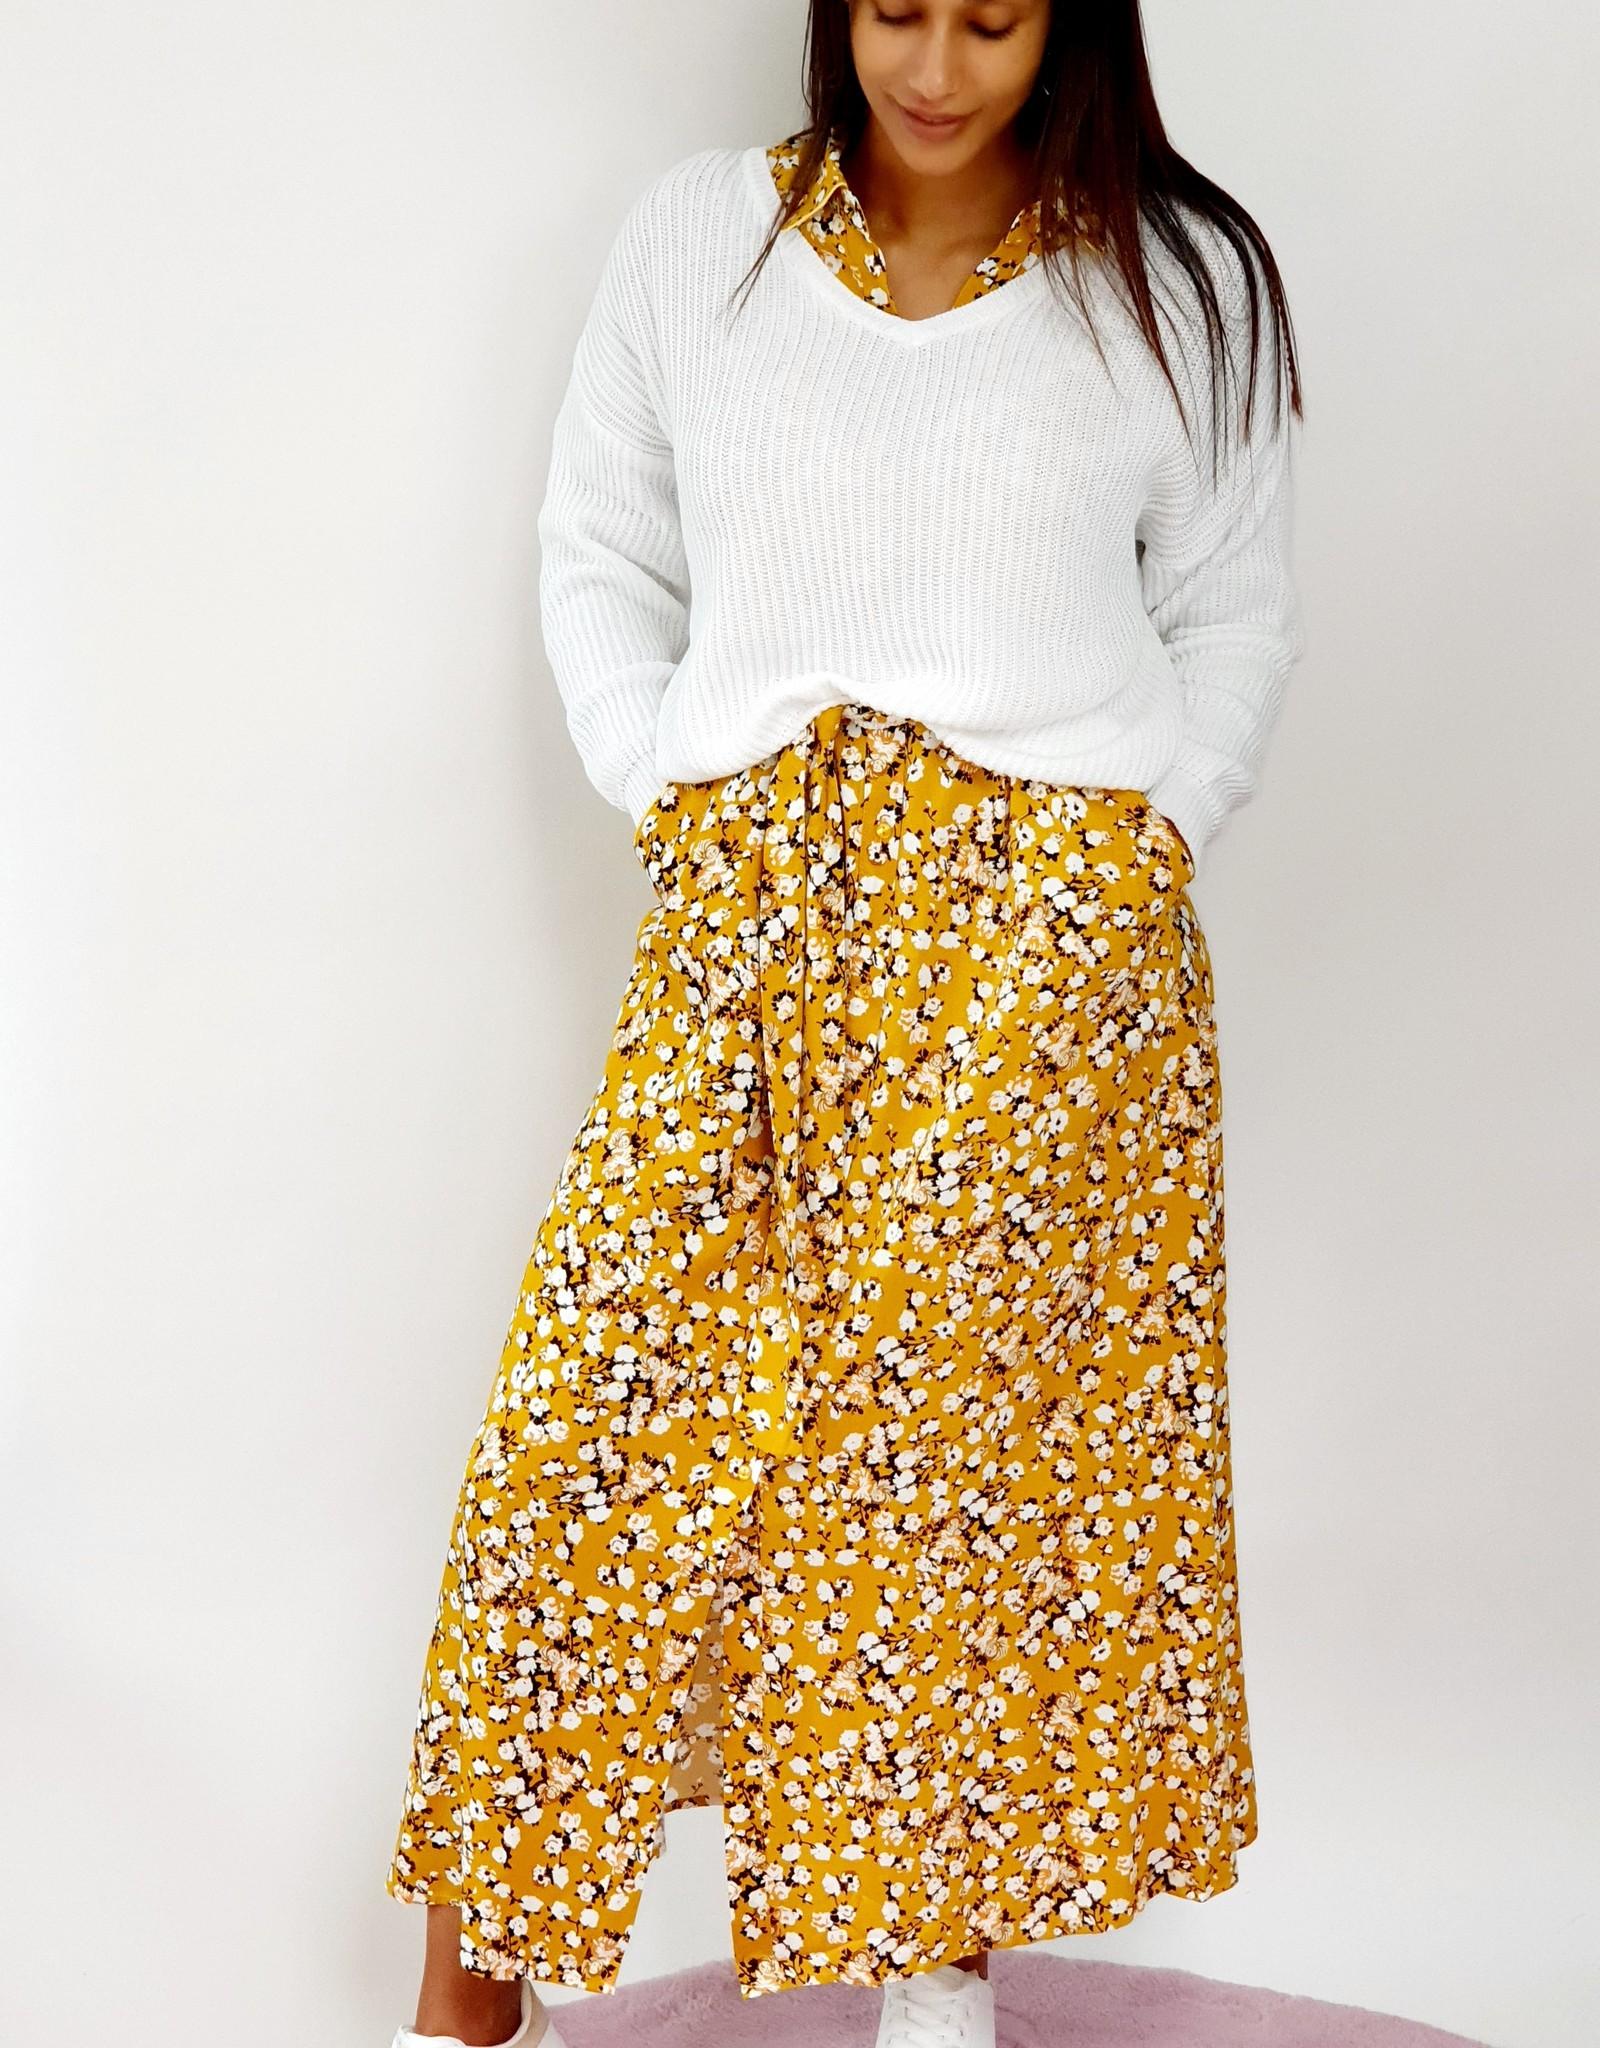 Thé yellow flower dress